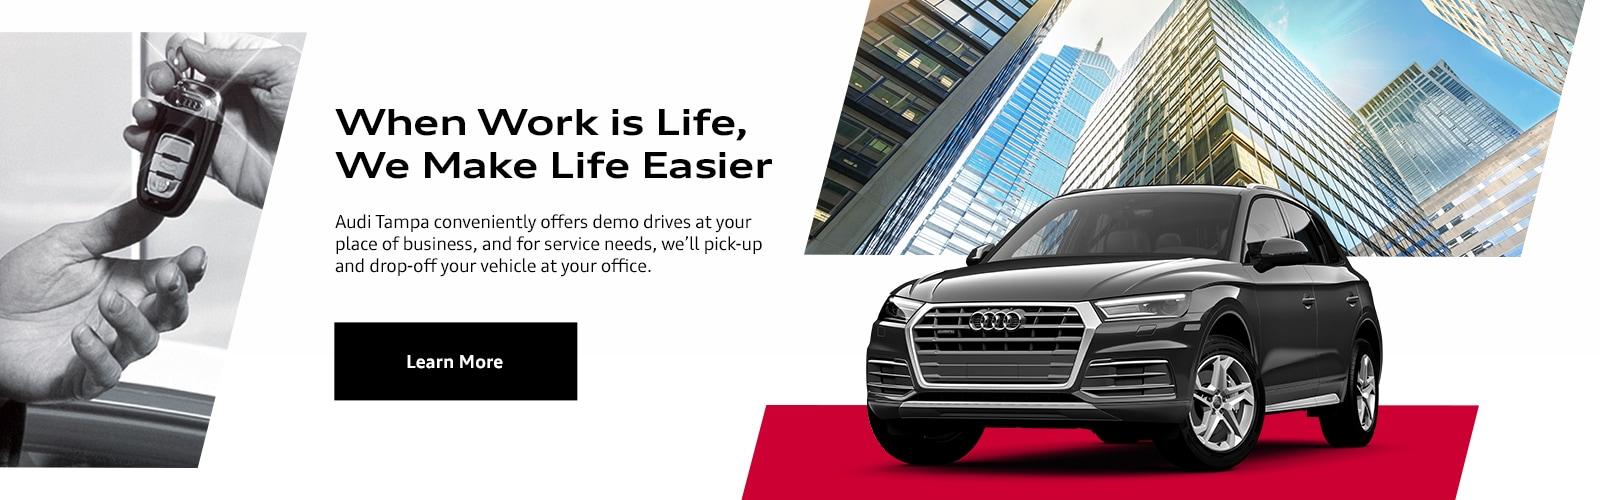 Audi Tampa New Used Audi Dealership Audi Cars For Sale Audi - Audi tampa